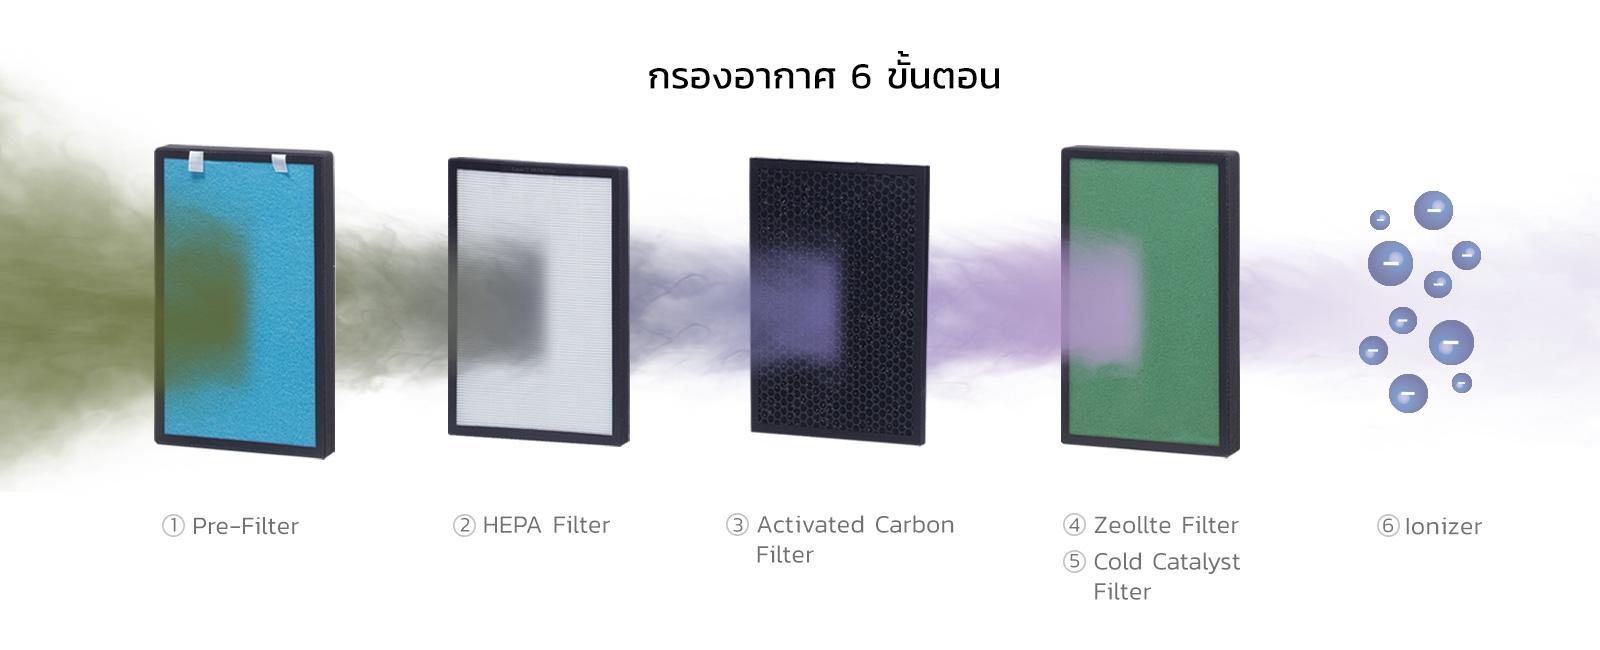 mitsuta-map450-feature-six-steps-air-purification